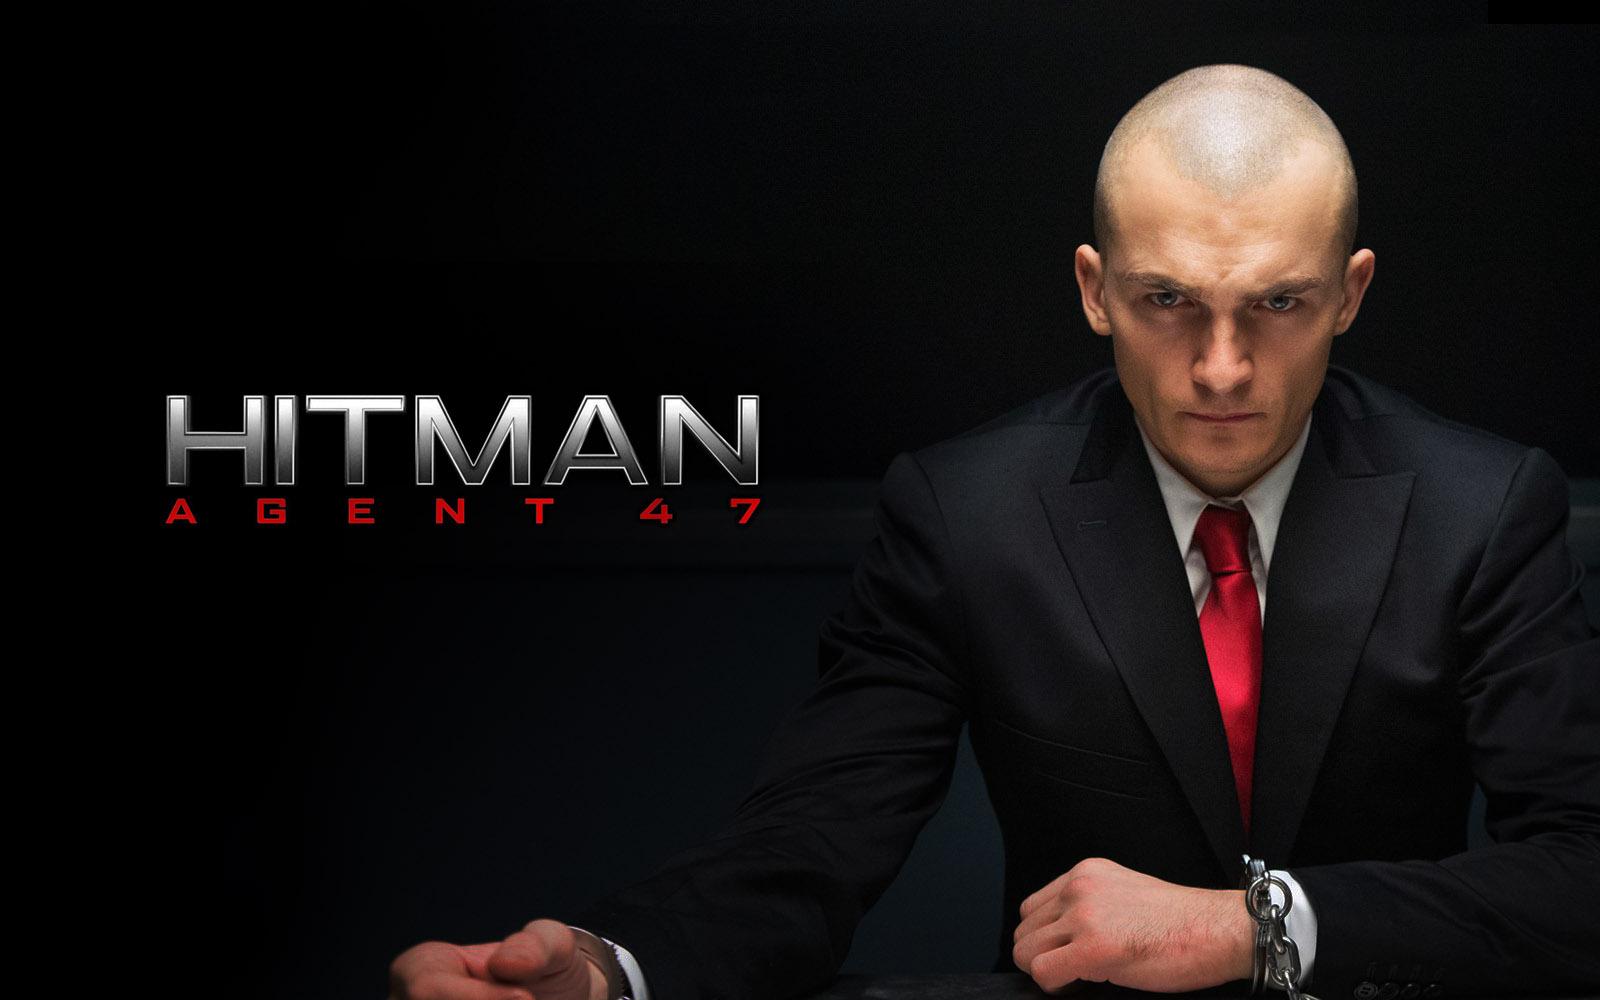 Hitman Agent 47 Entertainment Talk